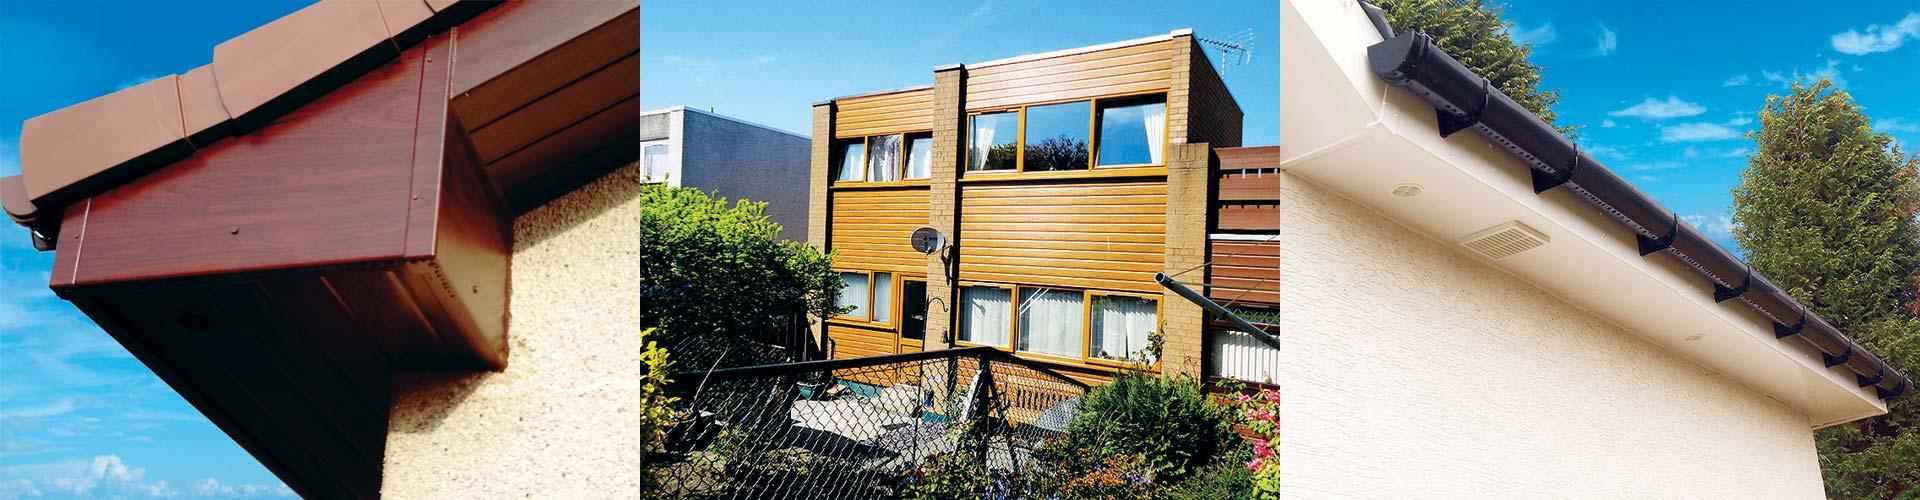 uPVC Roofline, Cladding, Soffits & Fascias Aberdeen, Aberdeenshire & North East Scotland